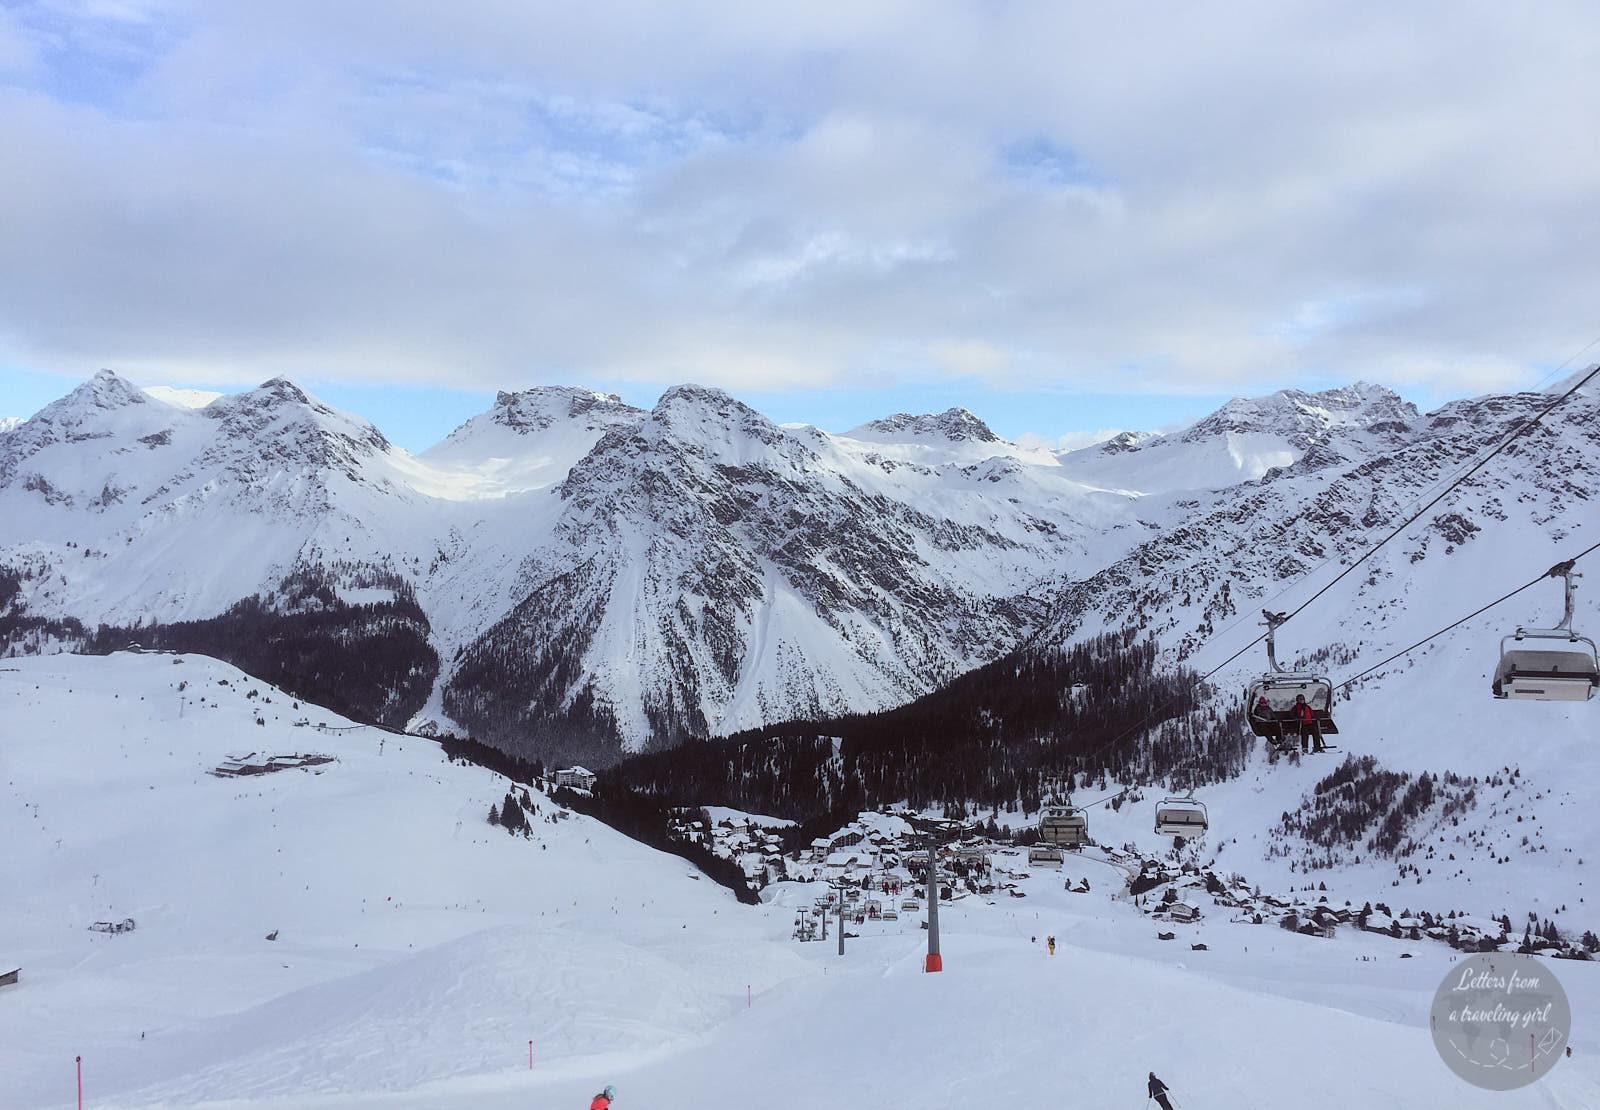 view in Arosa, Switzerland